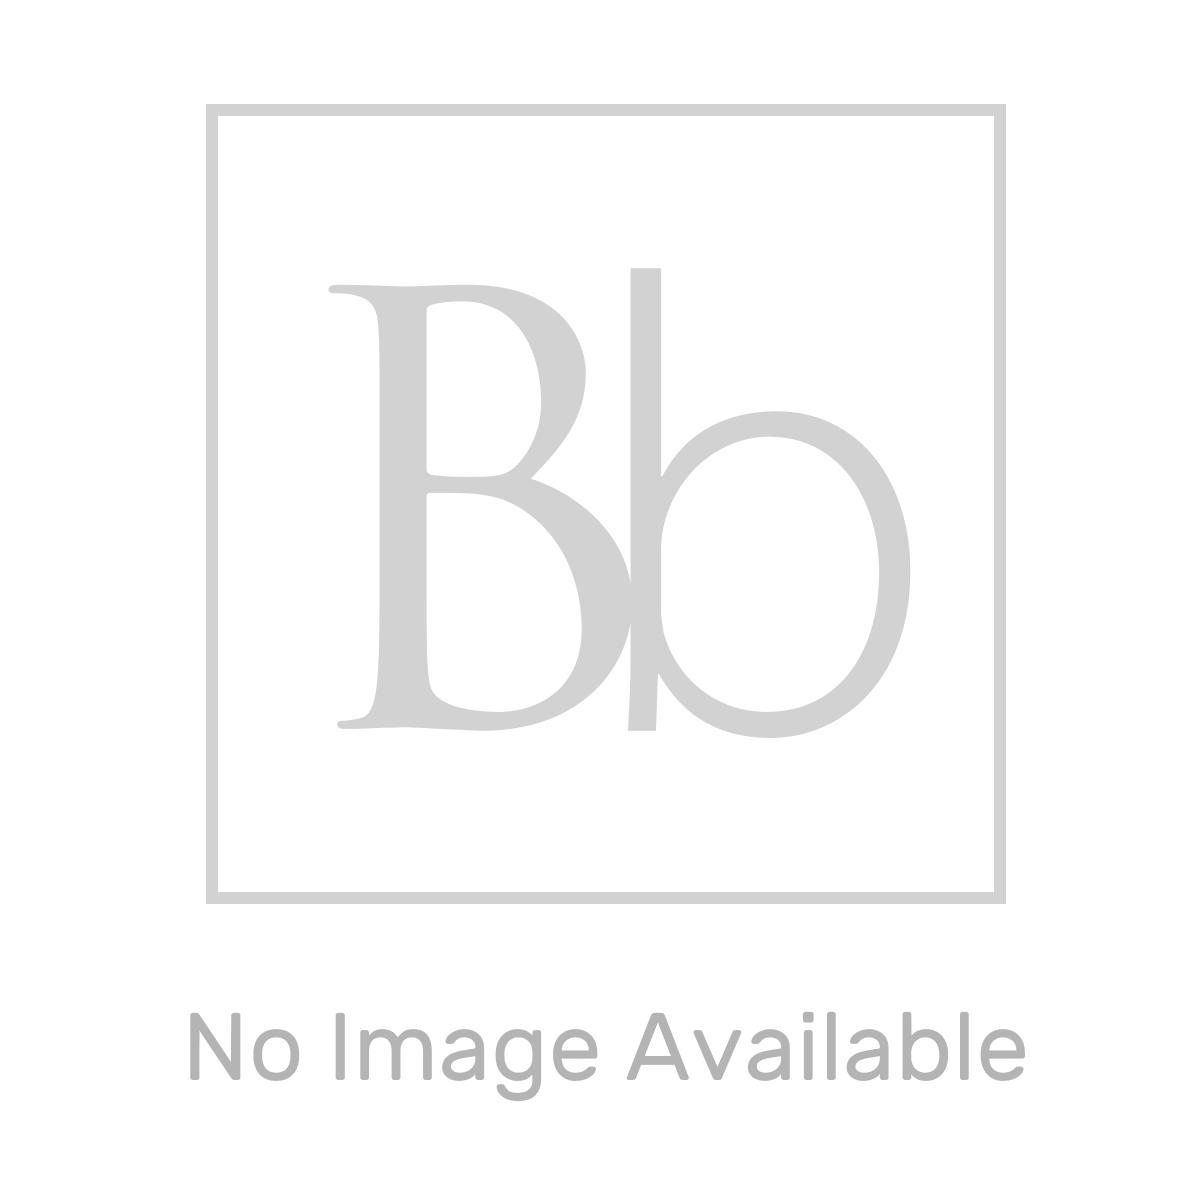 Aquadart Black Slate Shower Tray 1400 x 800 Overhead